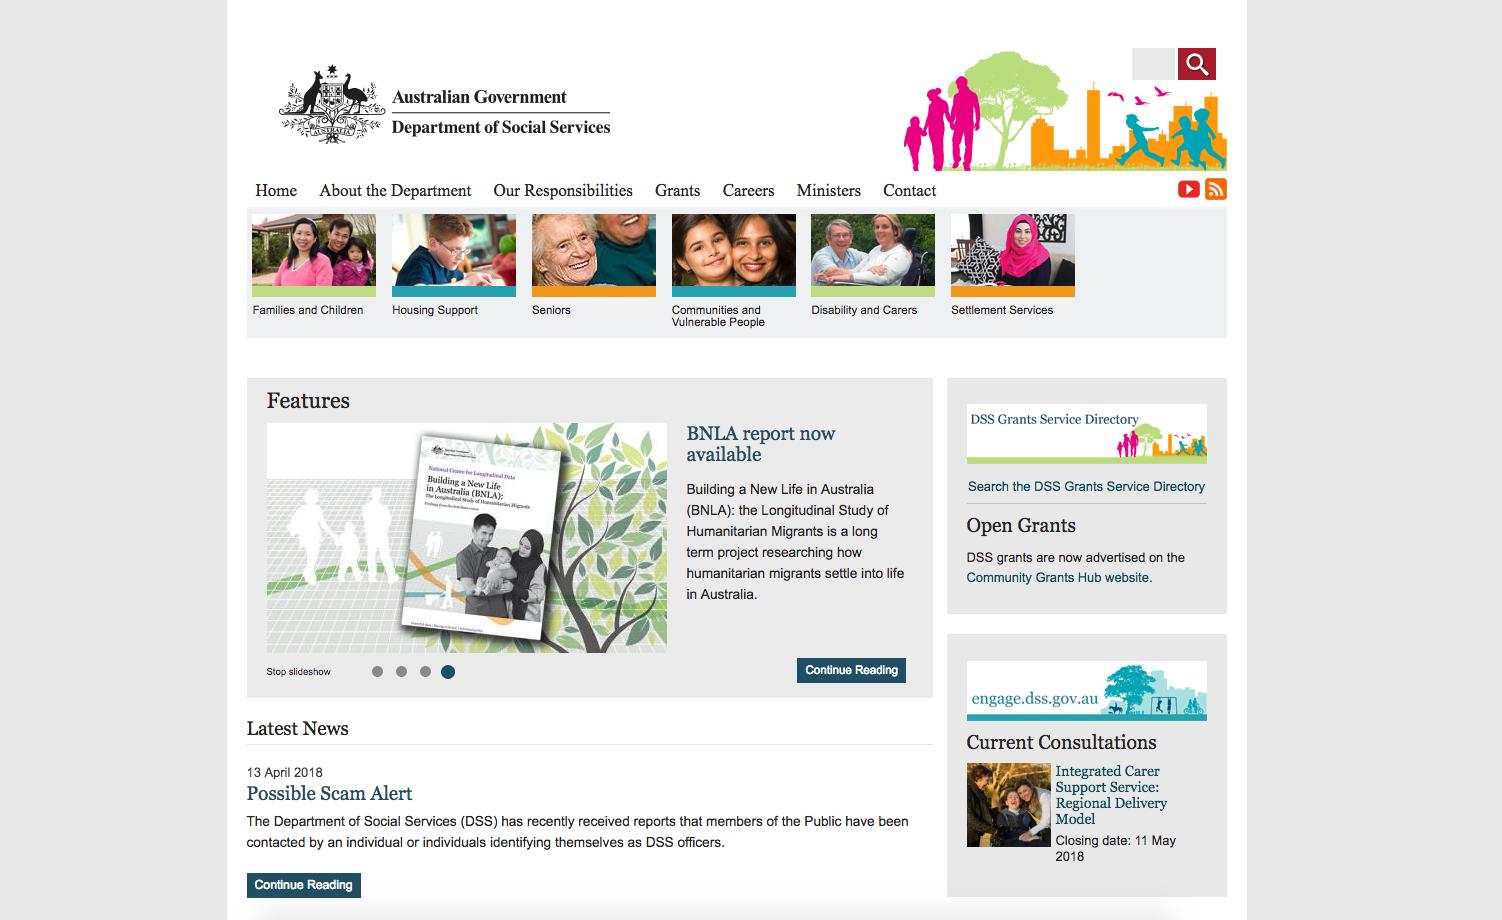 Department of Social Services - https://www.dss.gov.au/